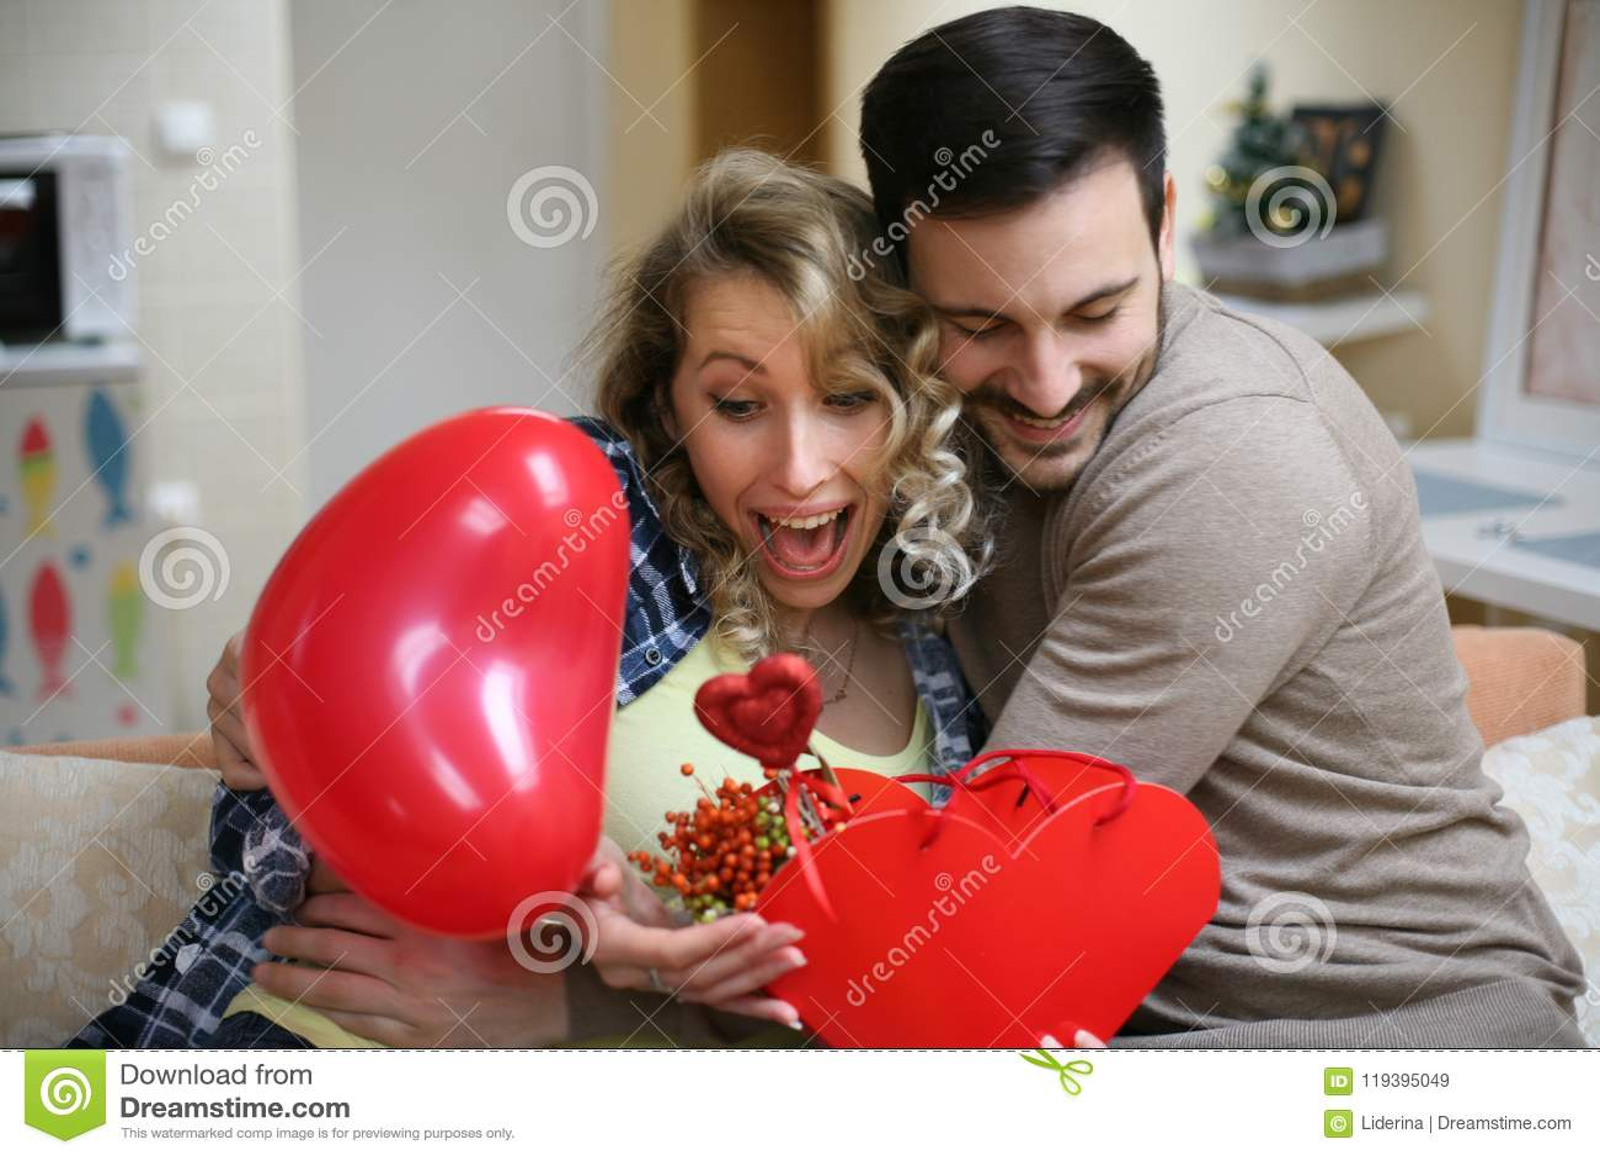 You Make My Life Beautiful Stock Image Image Of Flowers Balloon